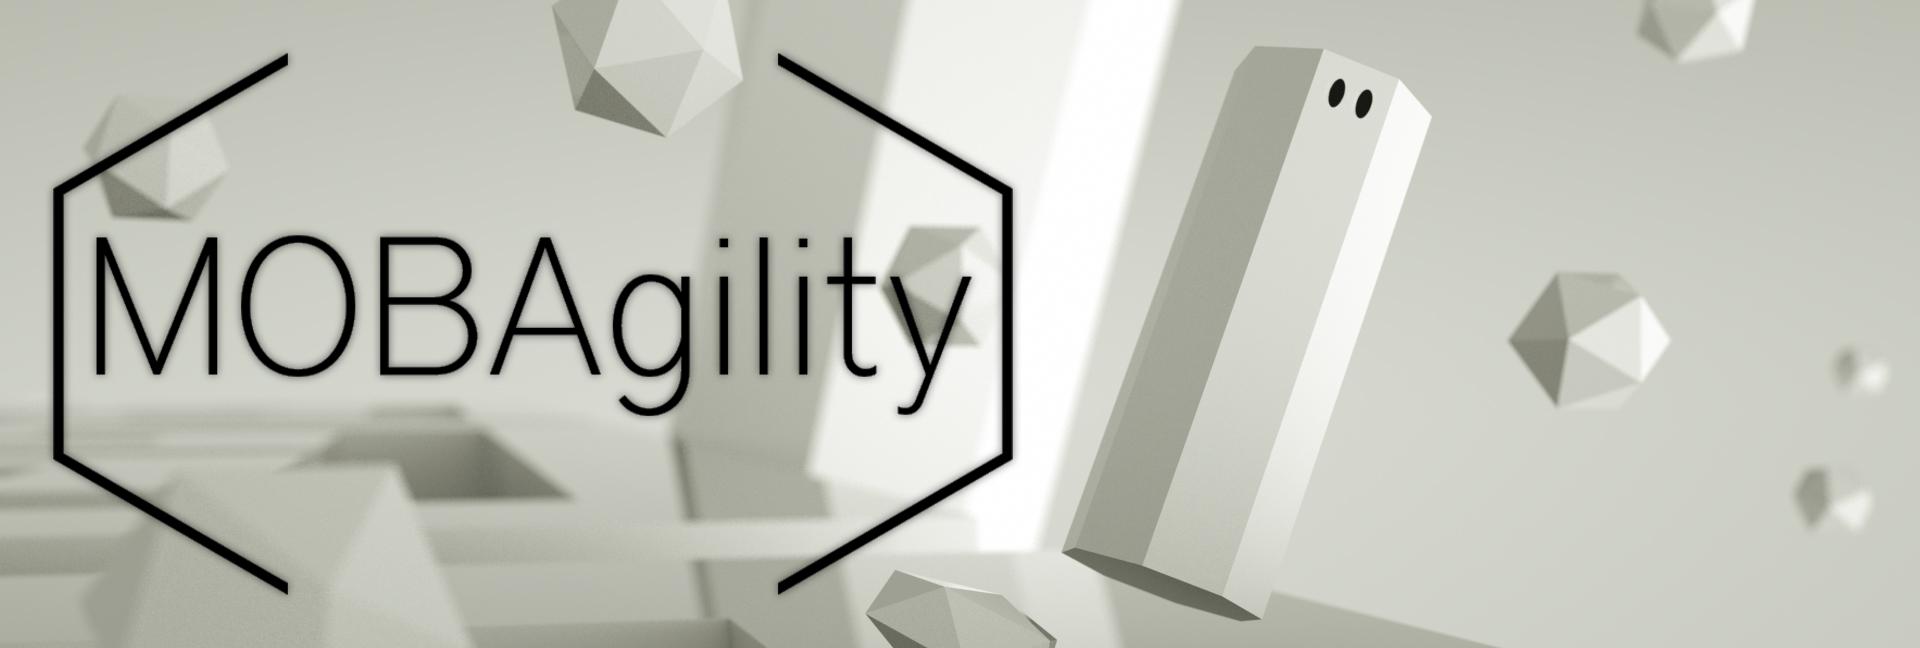 MOBAgility